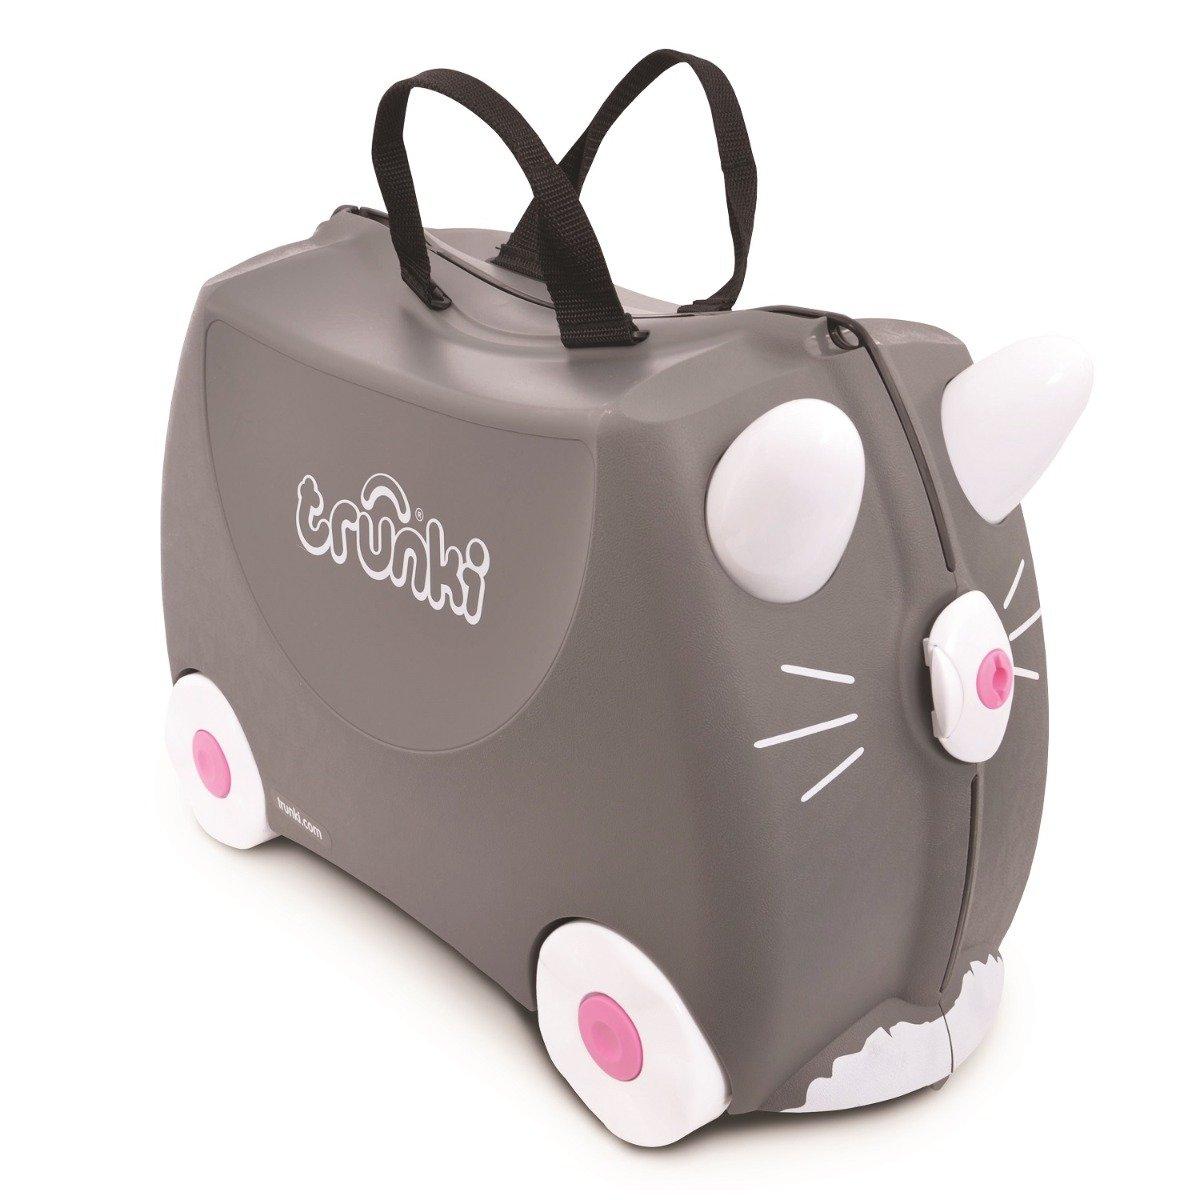 Valiza pentru copii Ride-On Benny Pisica Trunki, Gri, 46 cm imagine